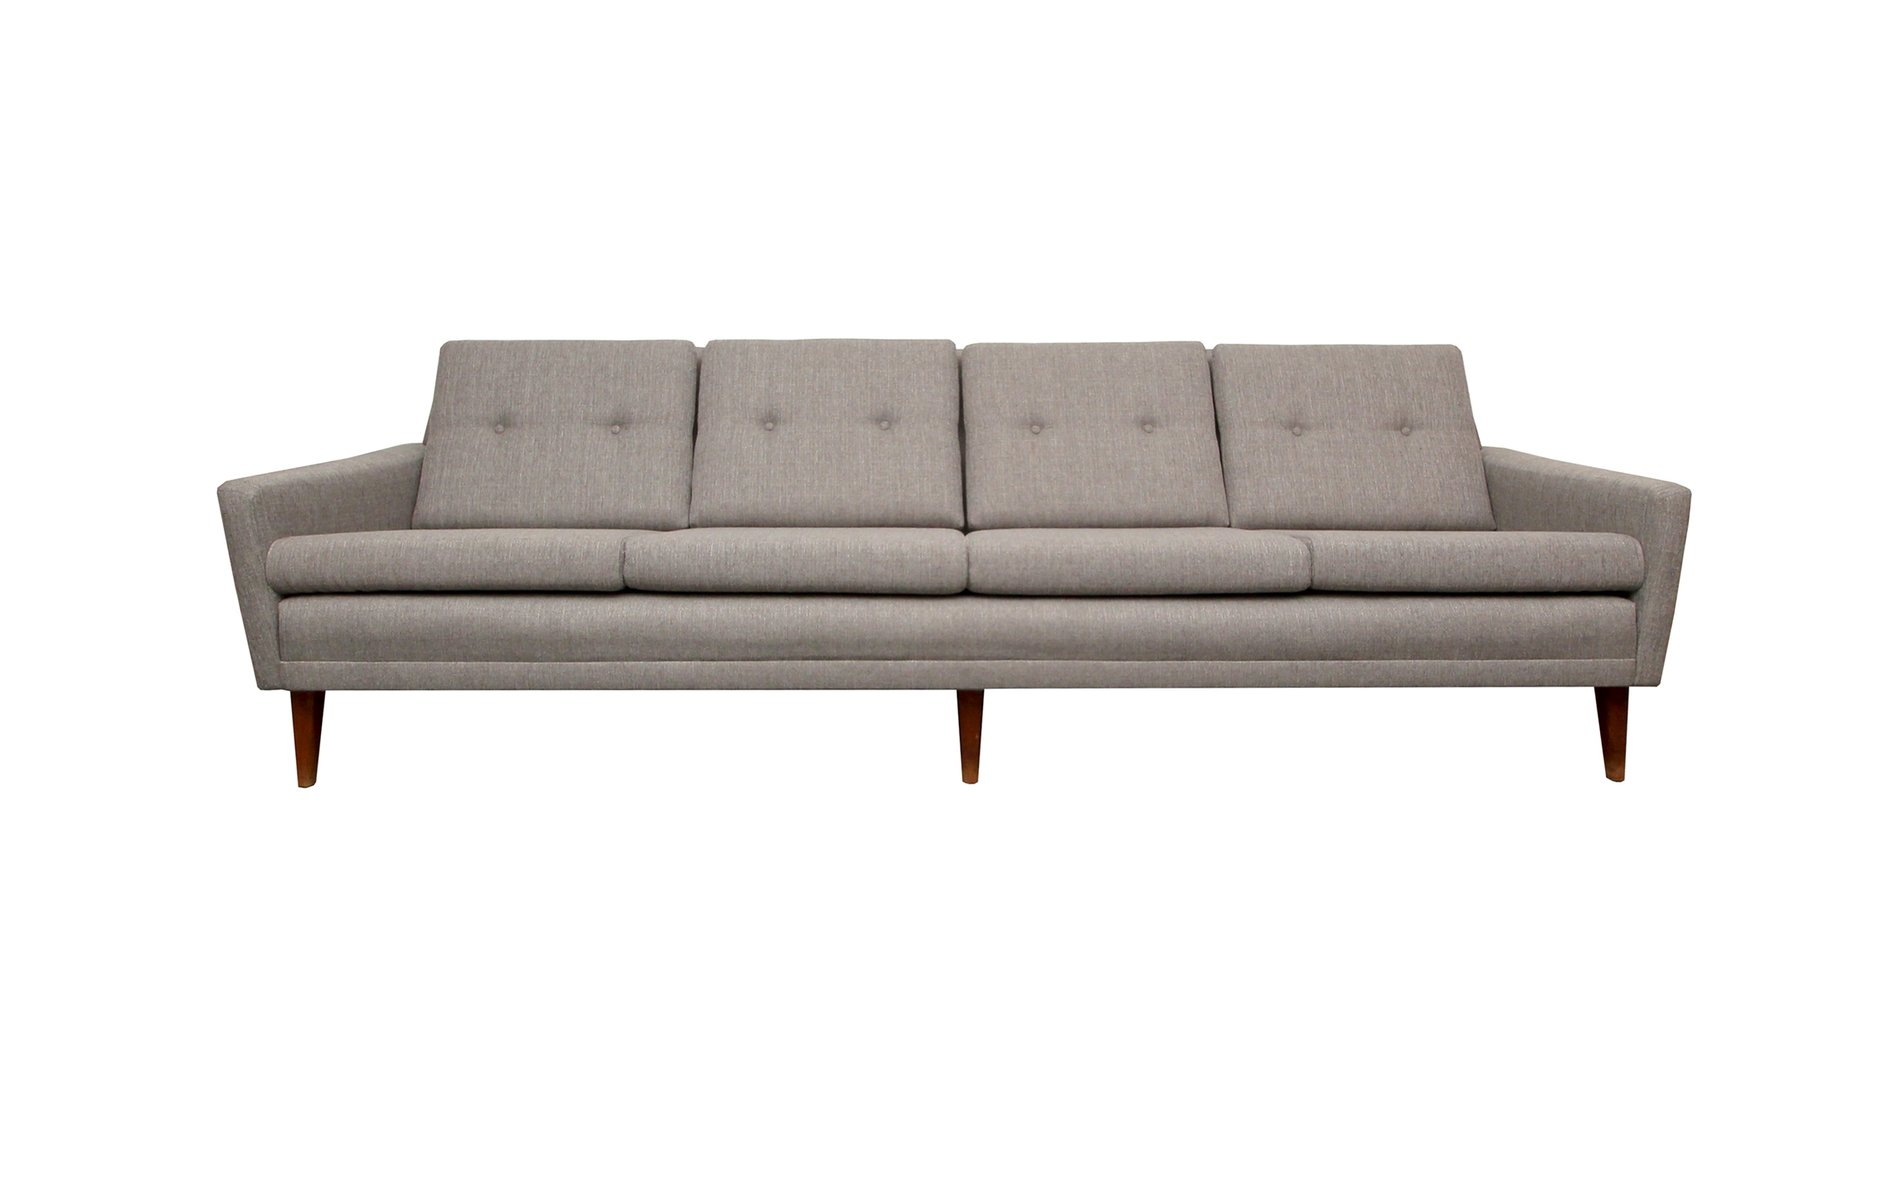 Light Grey Danish Sofa 1950s For Sale At Pamono